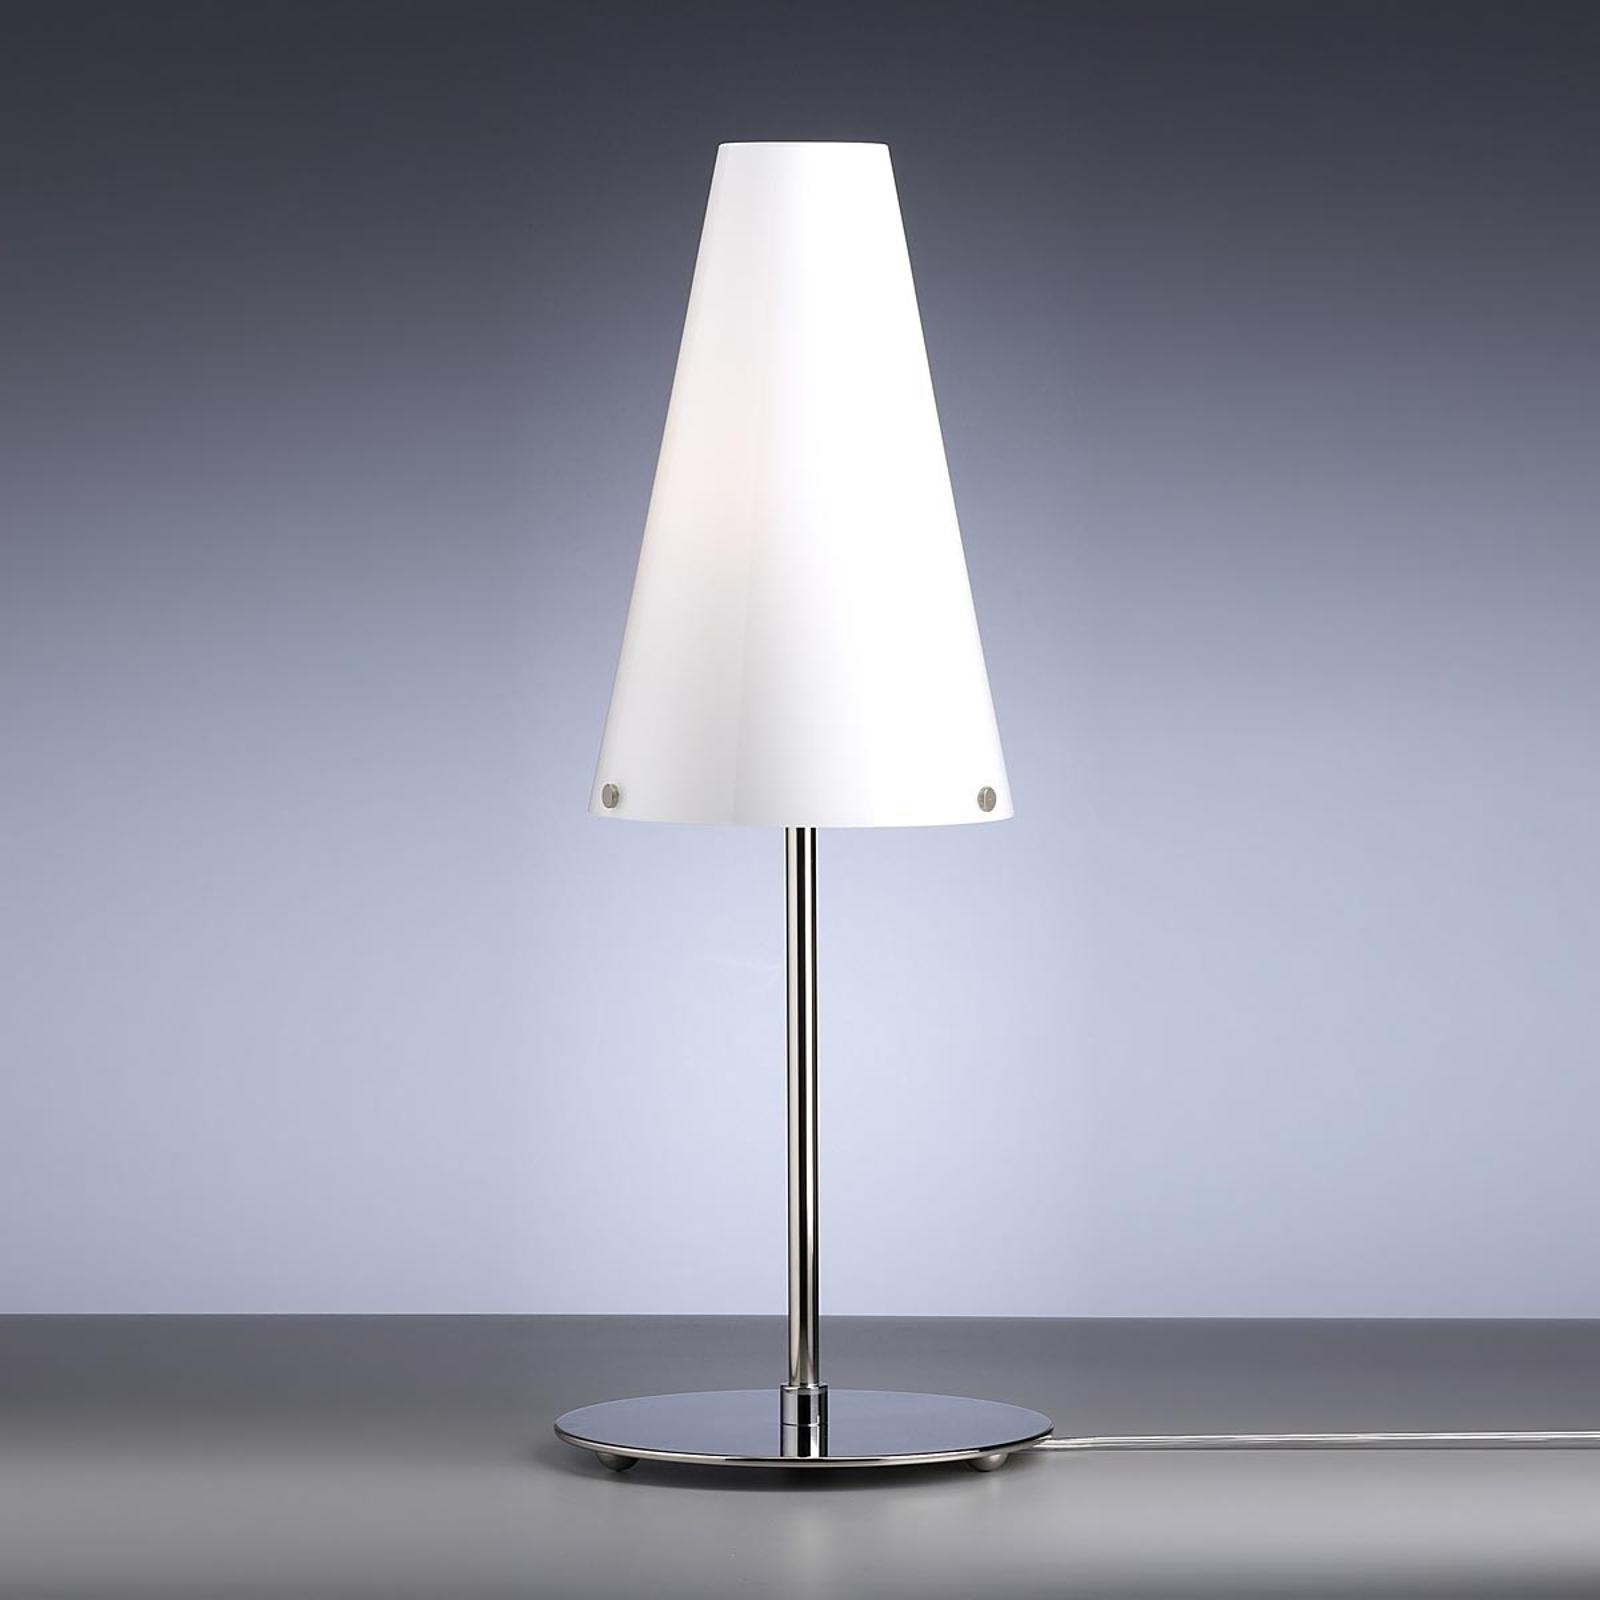 Lampa stołowa Waltera Schnepla opalowa